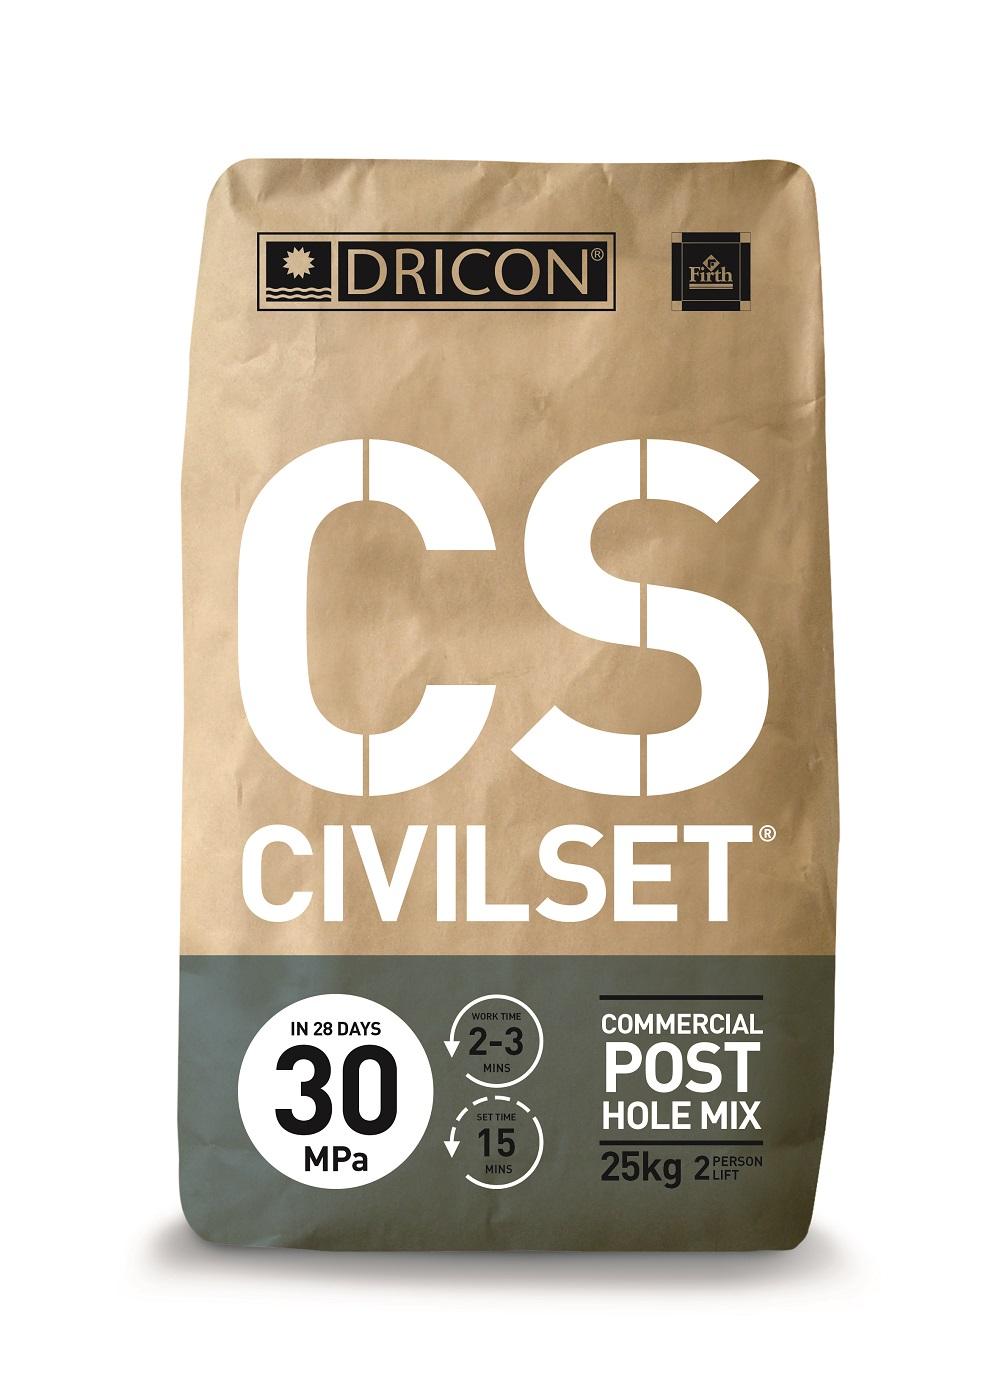 CivilSet